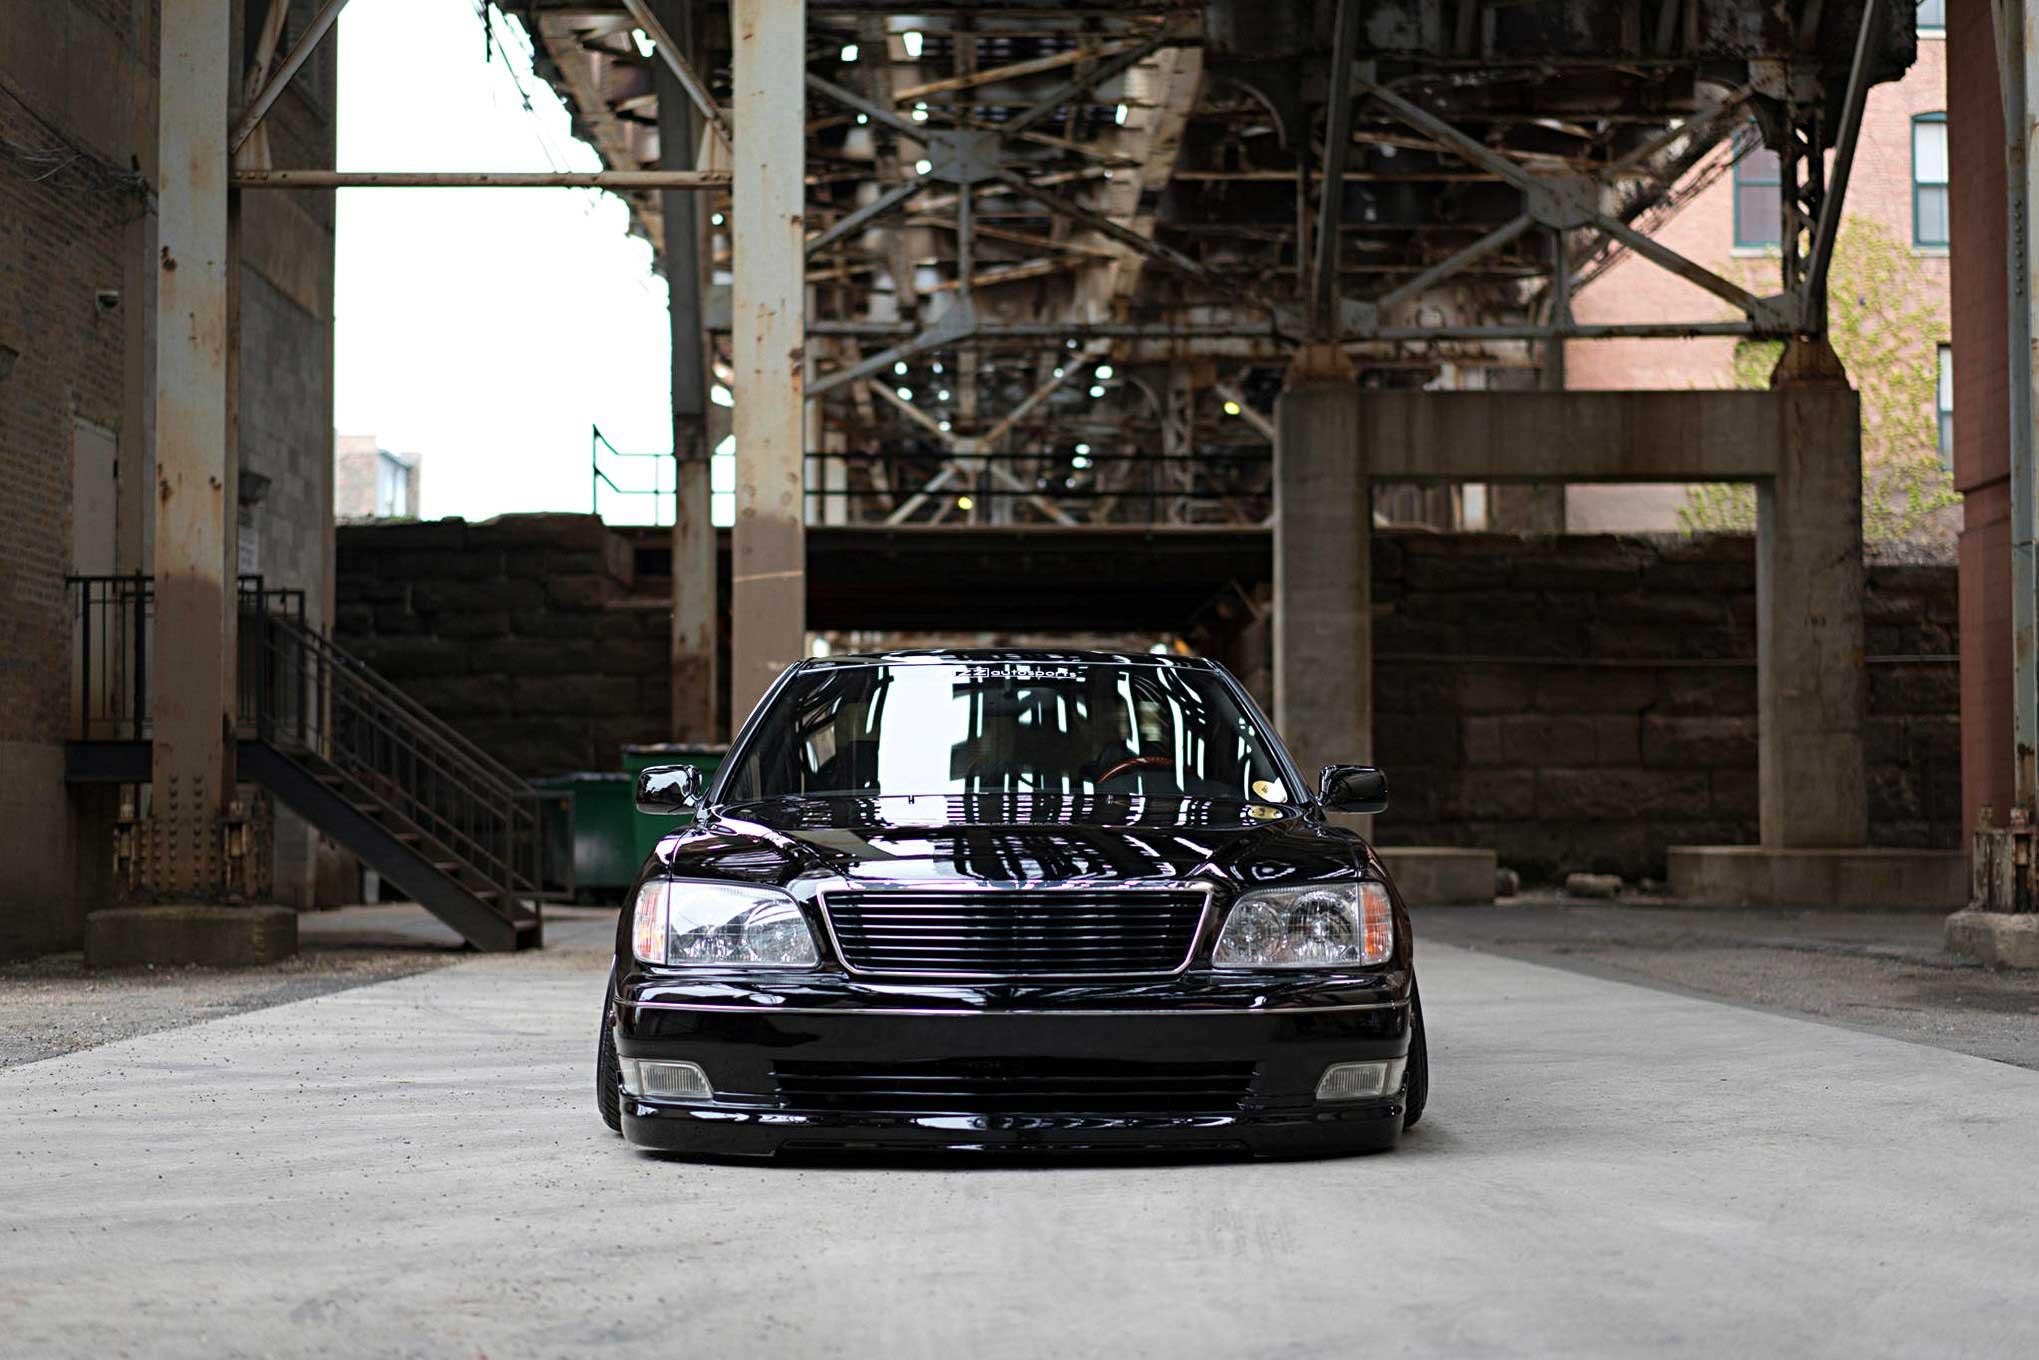 2000 Lexus LS400 - Very  Important  Project